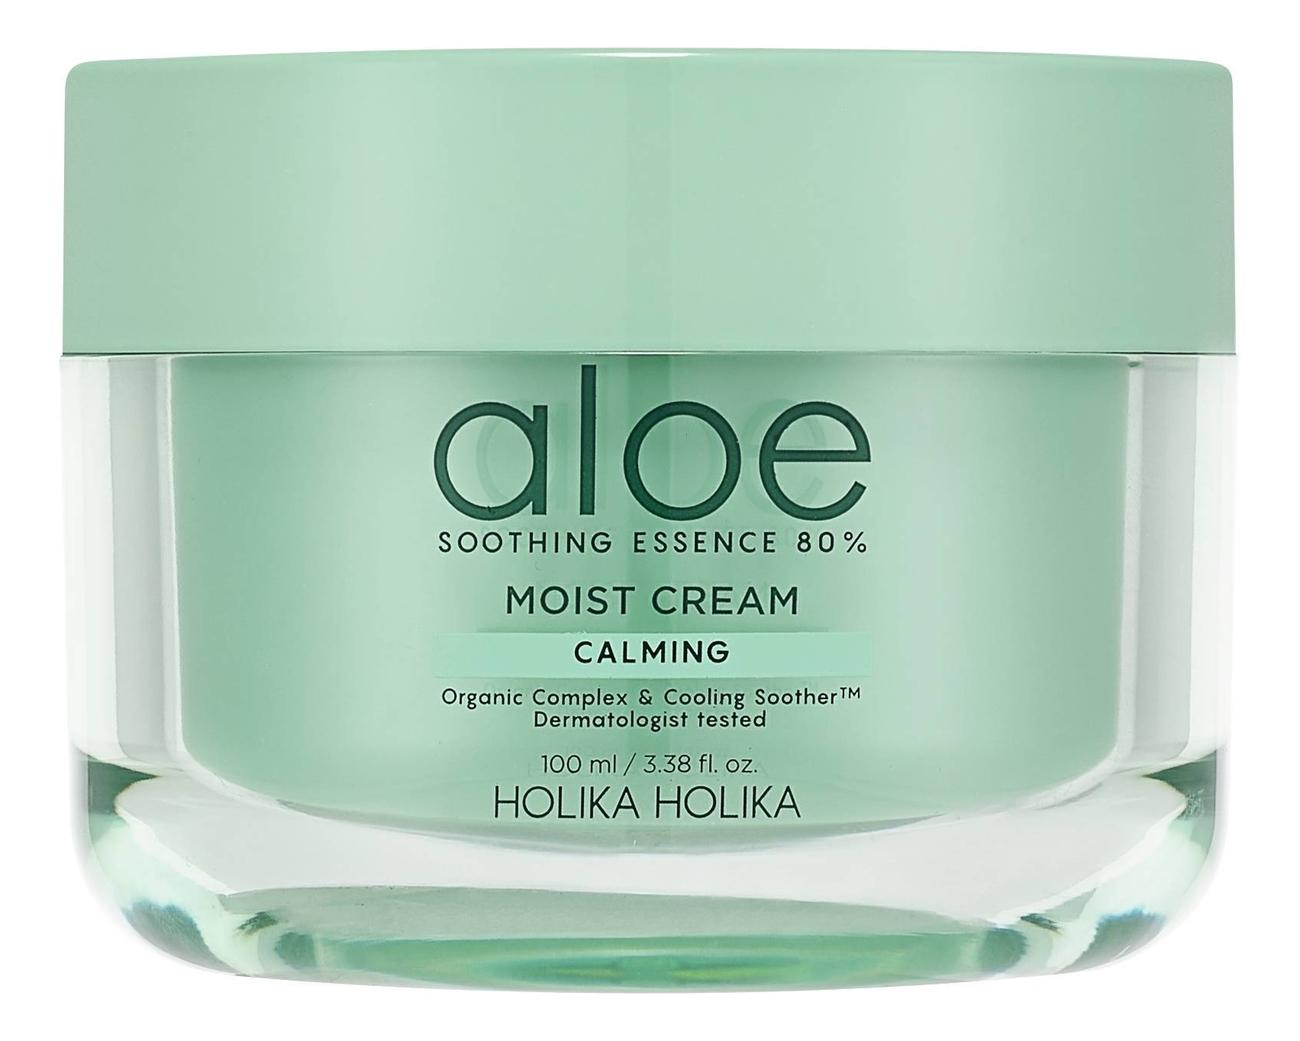 Фото - Увлажняющий крем для лица Aloe Soothing Essence 80% Moist Cream 100мл holika holika aloe soothing essence 90% emulsion увлажняющая эмульсия для лица 200 мл